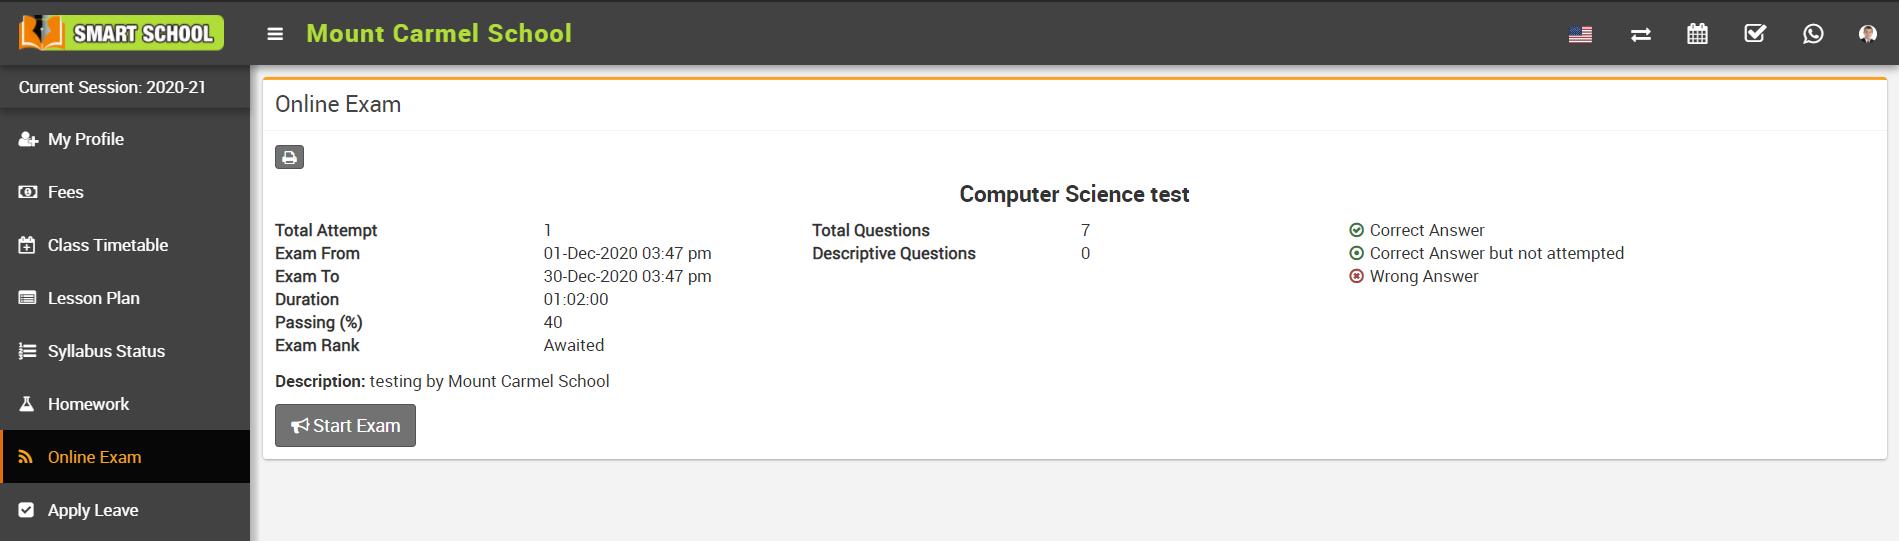 student online exam detail